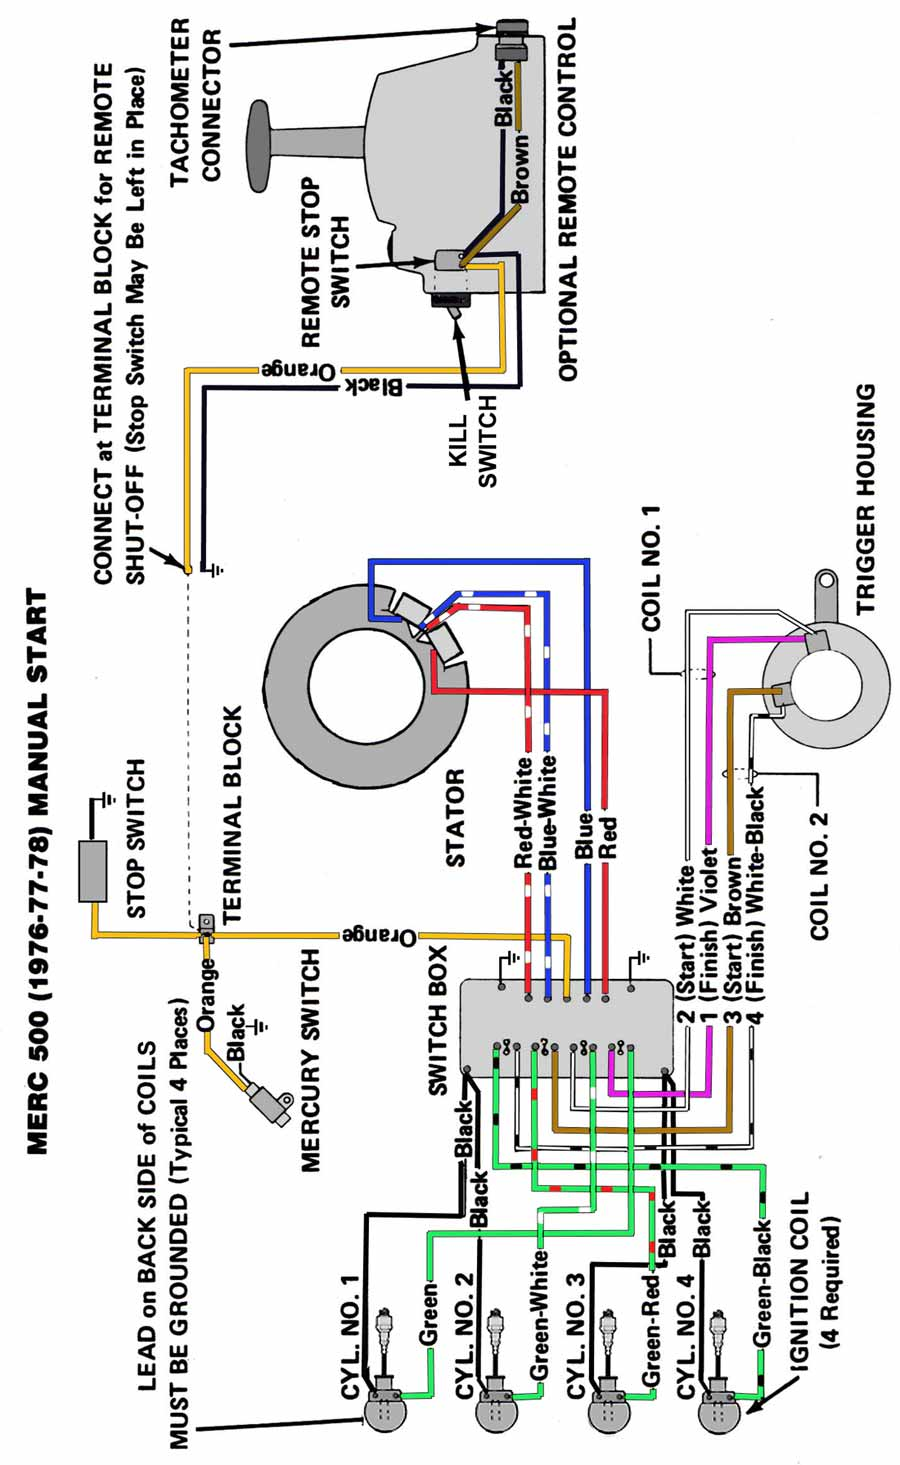 85 hp mercury wiring diagram mercury tilt switch wiring diagram   odicis mercury 115 ignition switch wiring mercury trim switch wiring diagram